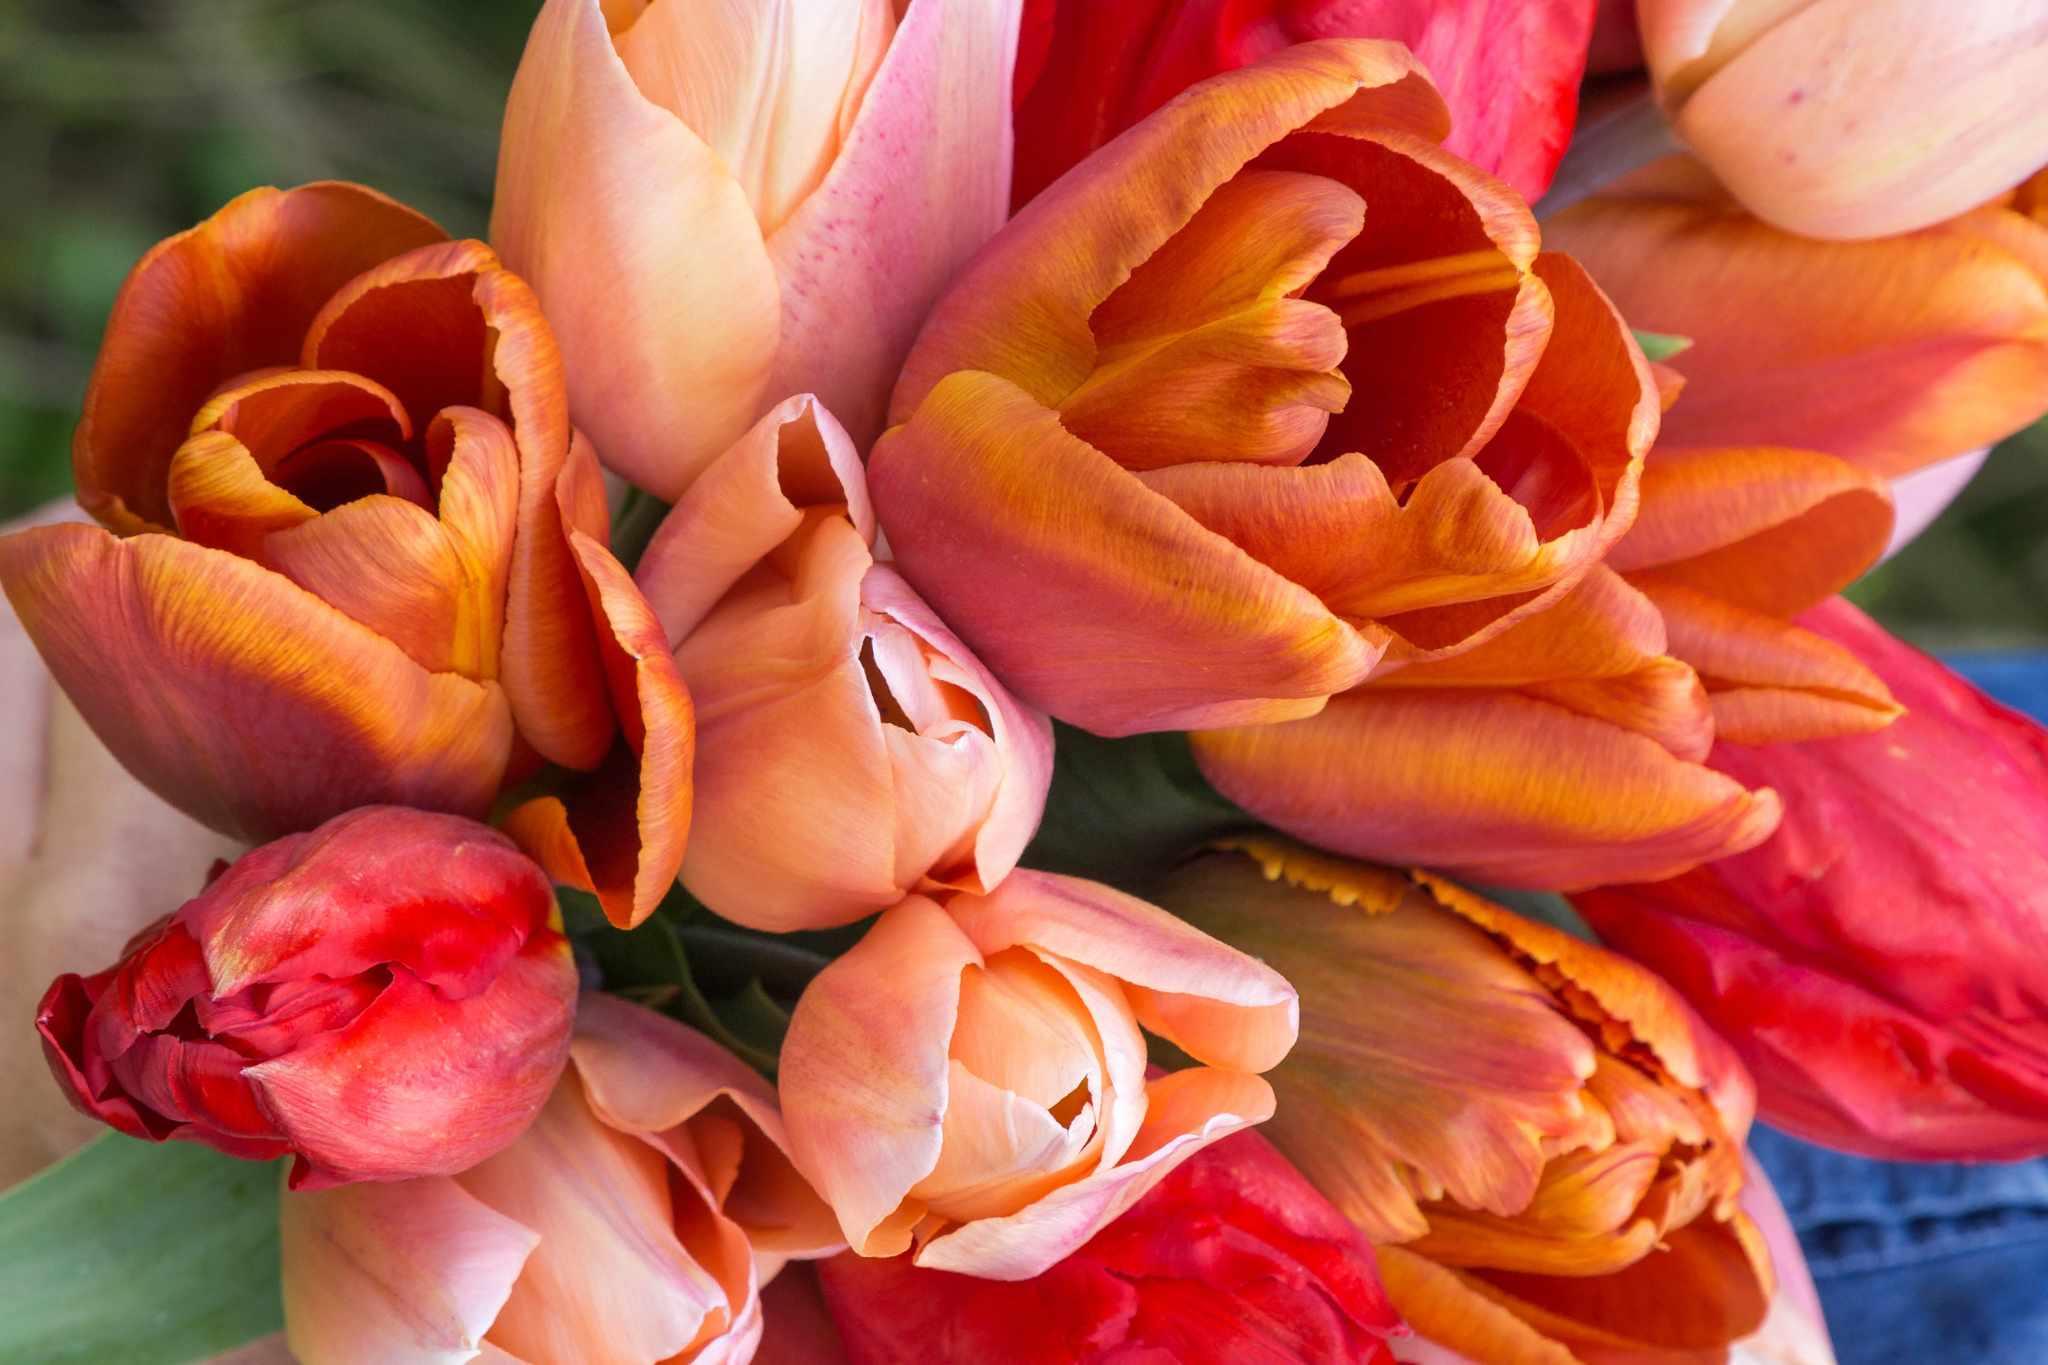 woolmans-free-tulips-2048-1365